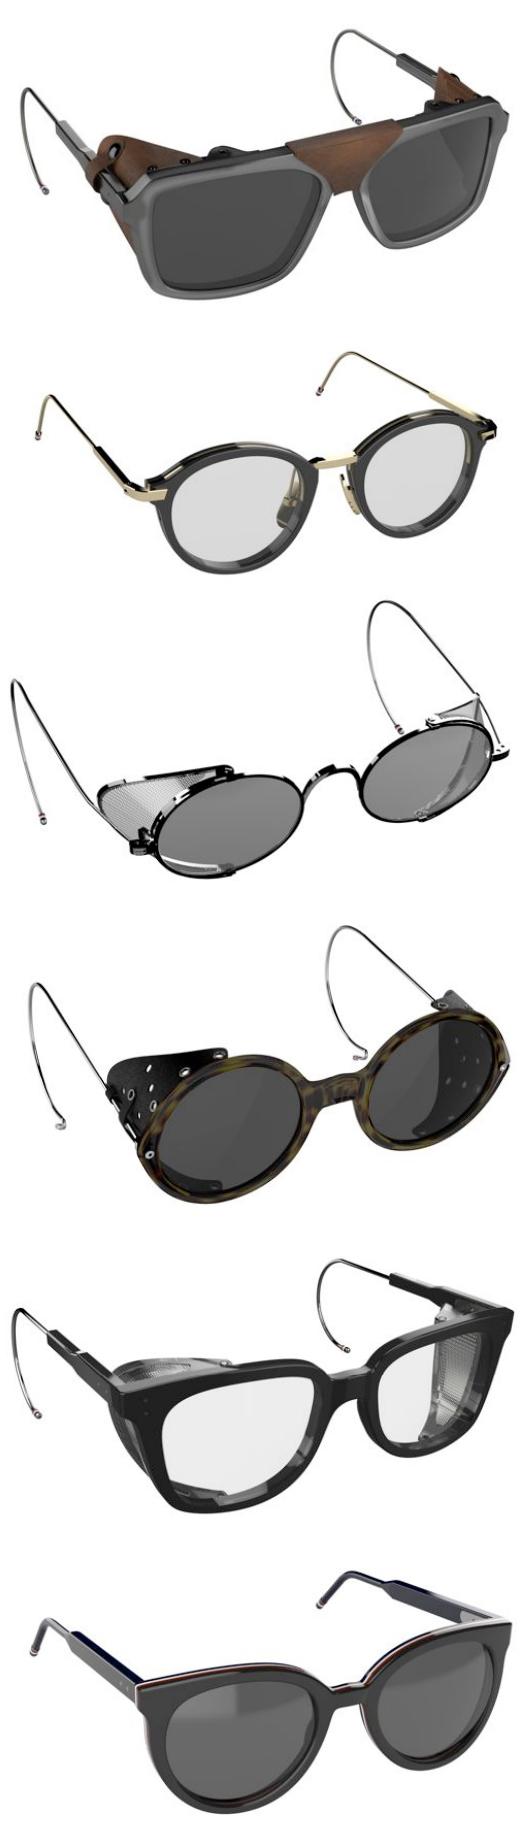 5deb5e2b620 Eyewear  Archive  - StyleZeitgeist